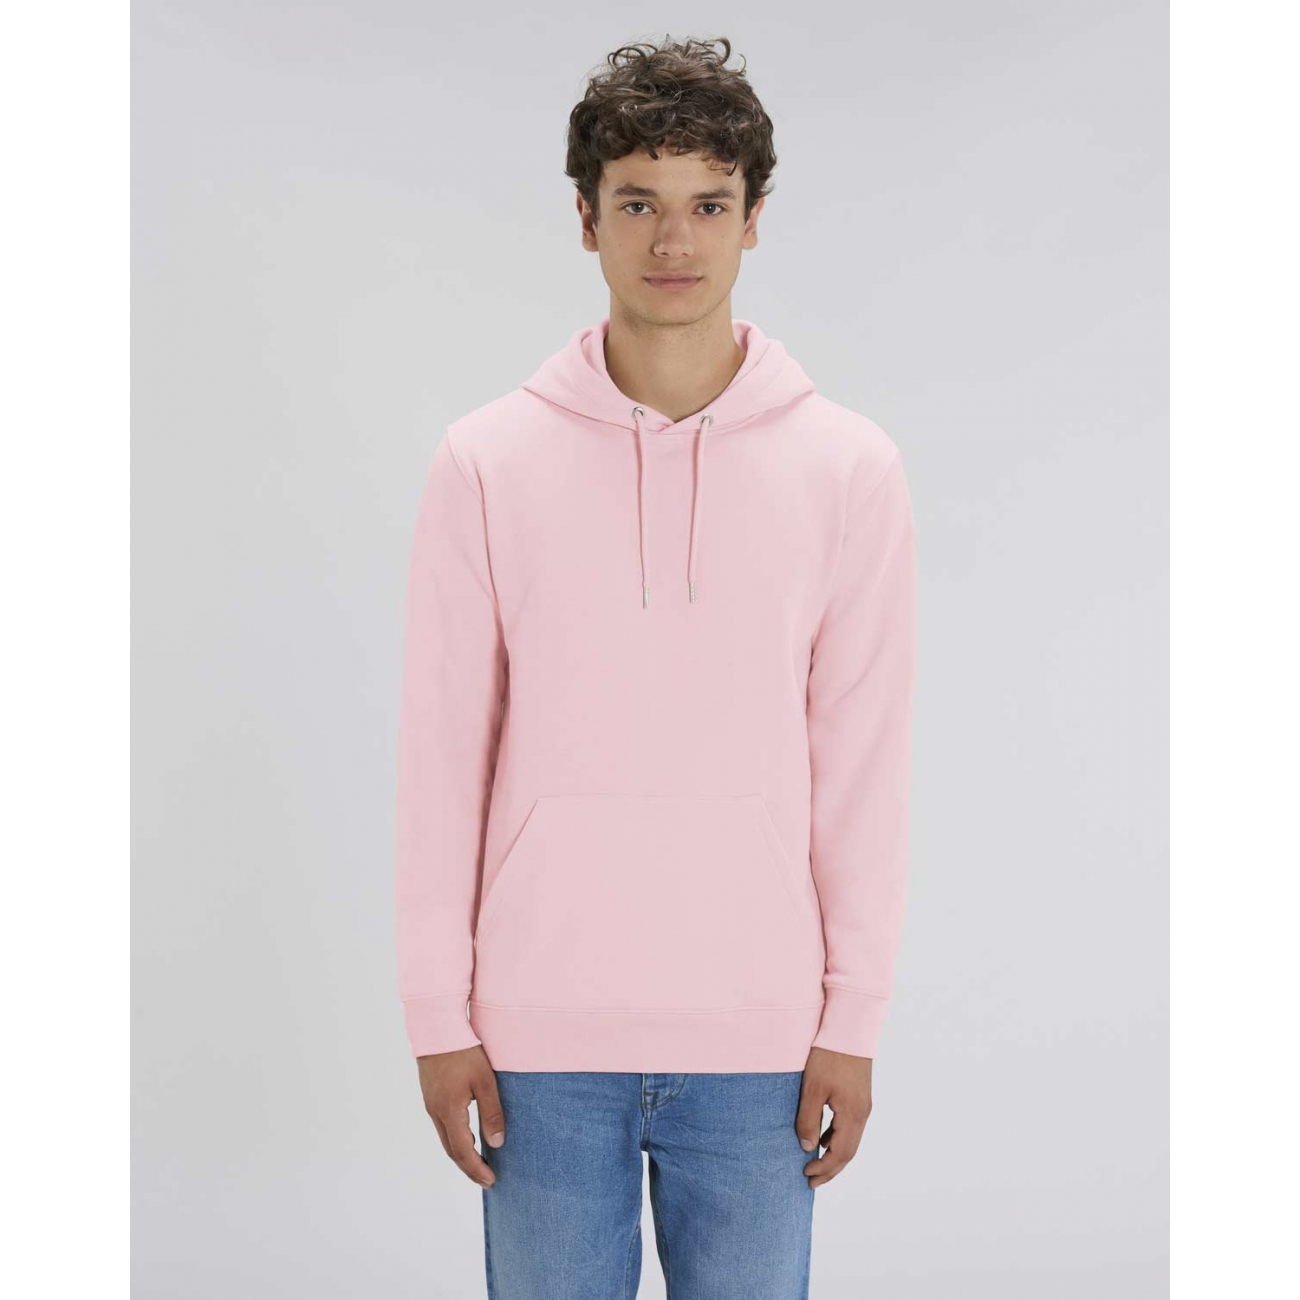 https://tee-shirt-bio.com/7112-thickbox_default/sweat-shirt-capuche-epais-et-interieur-doux-coton-bio-rose-cruiser.jpg